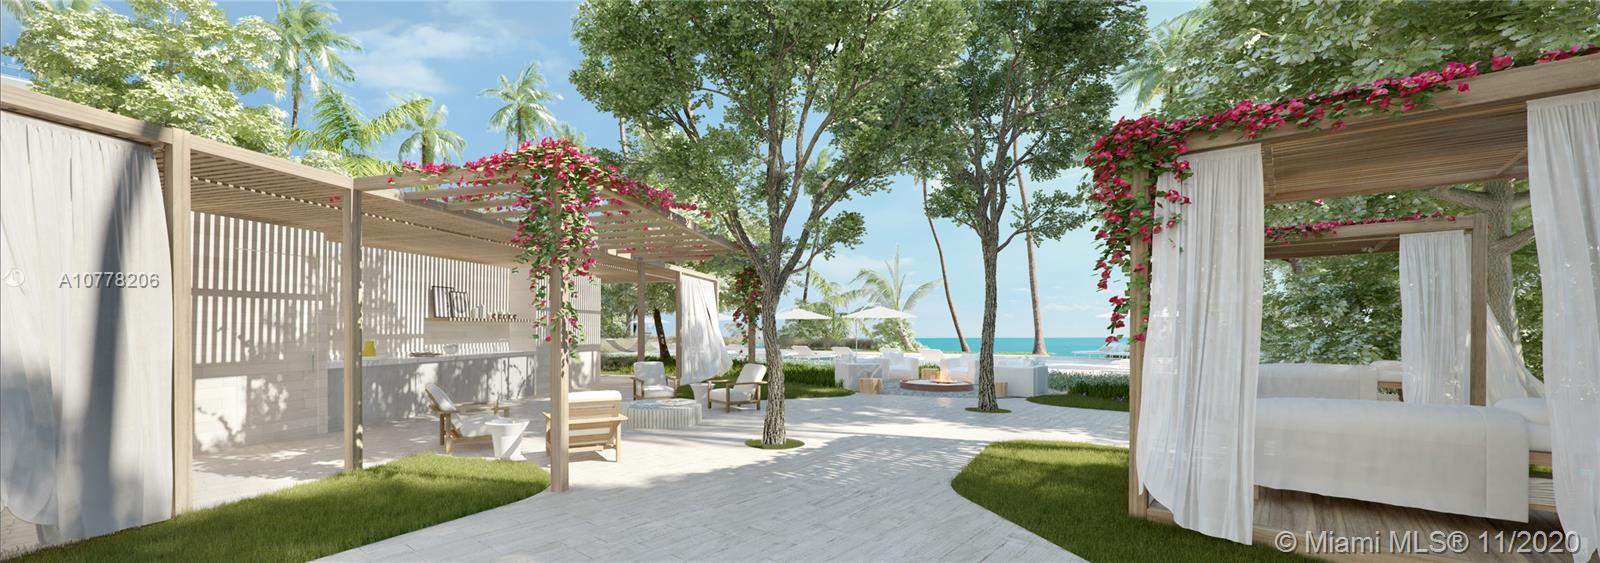 Auberge Beach Residences & Spa image #61